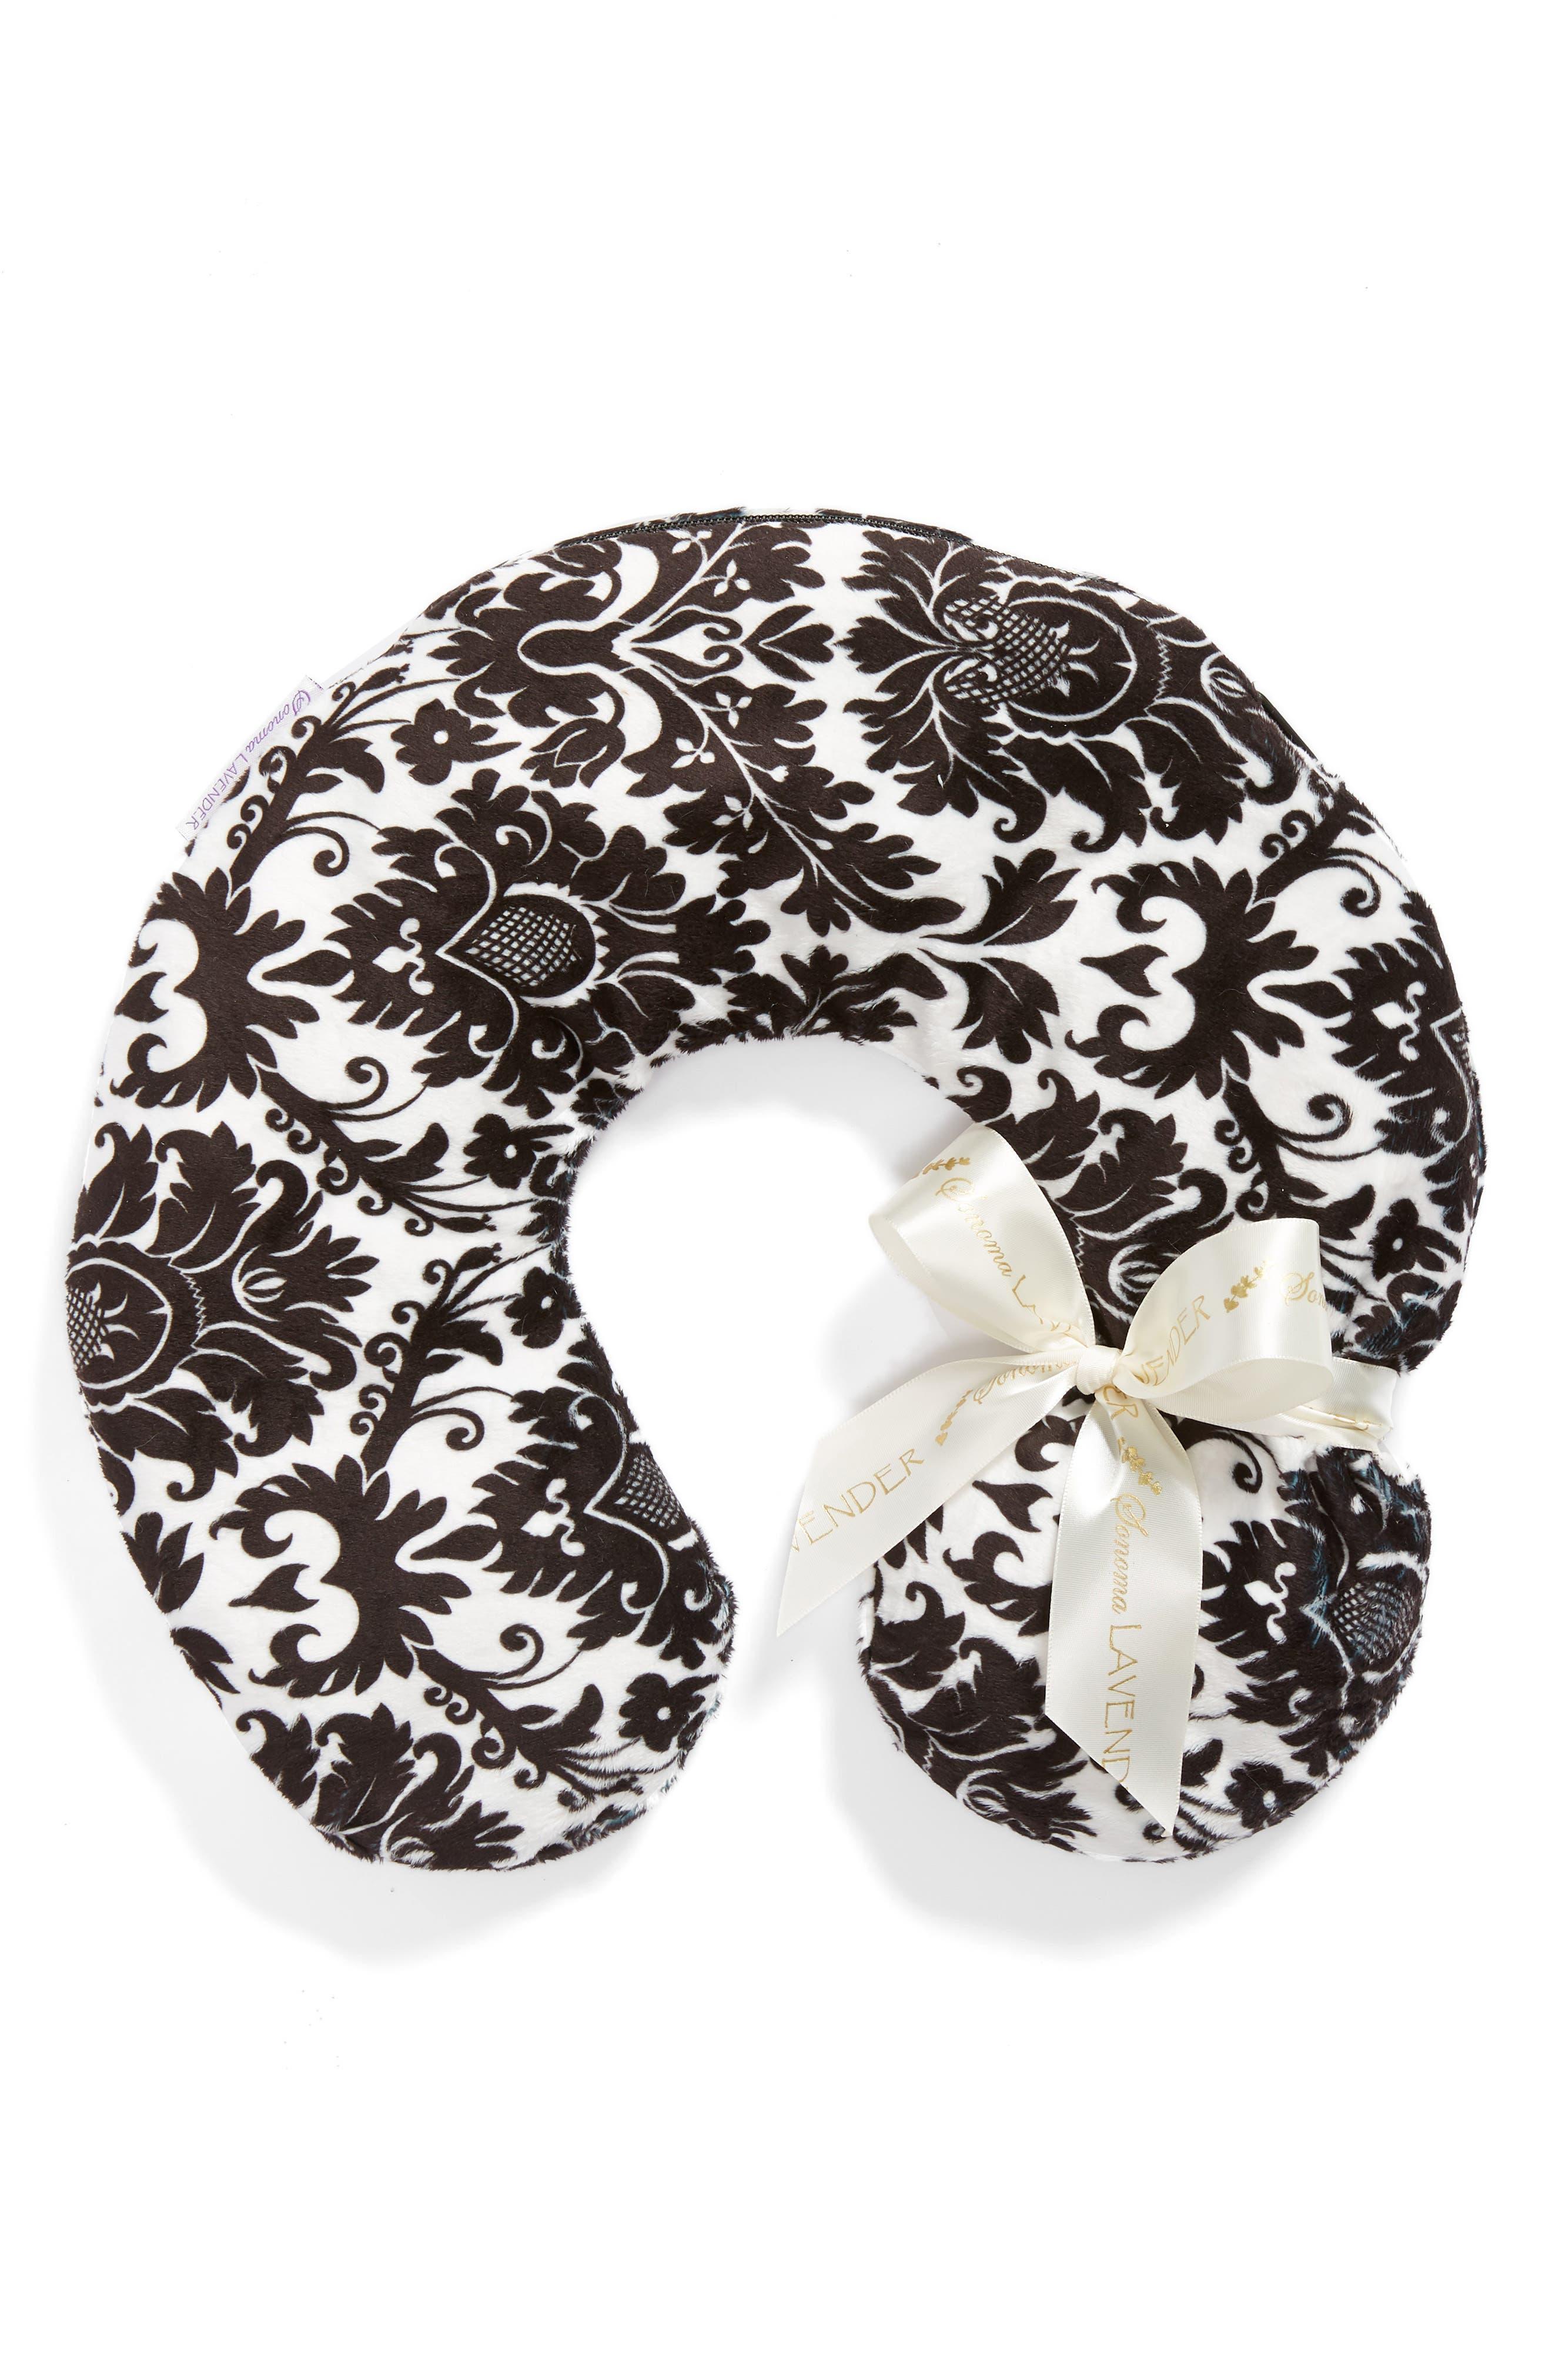 Black Damask Neck Pillow,                             Main thumbnail 1, color,                             000